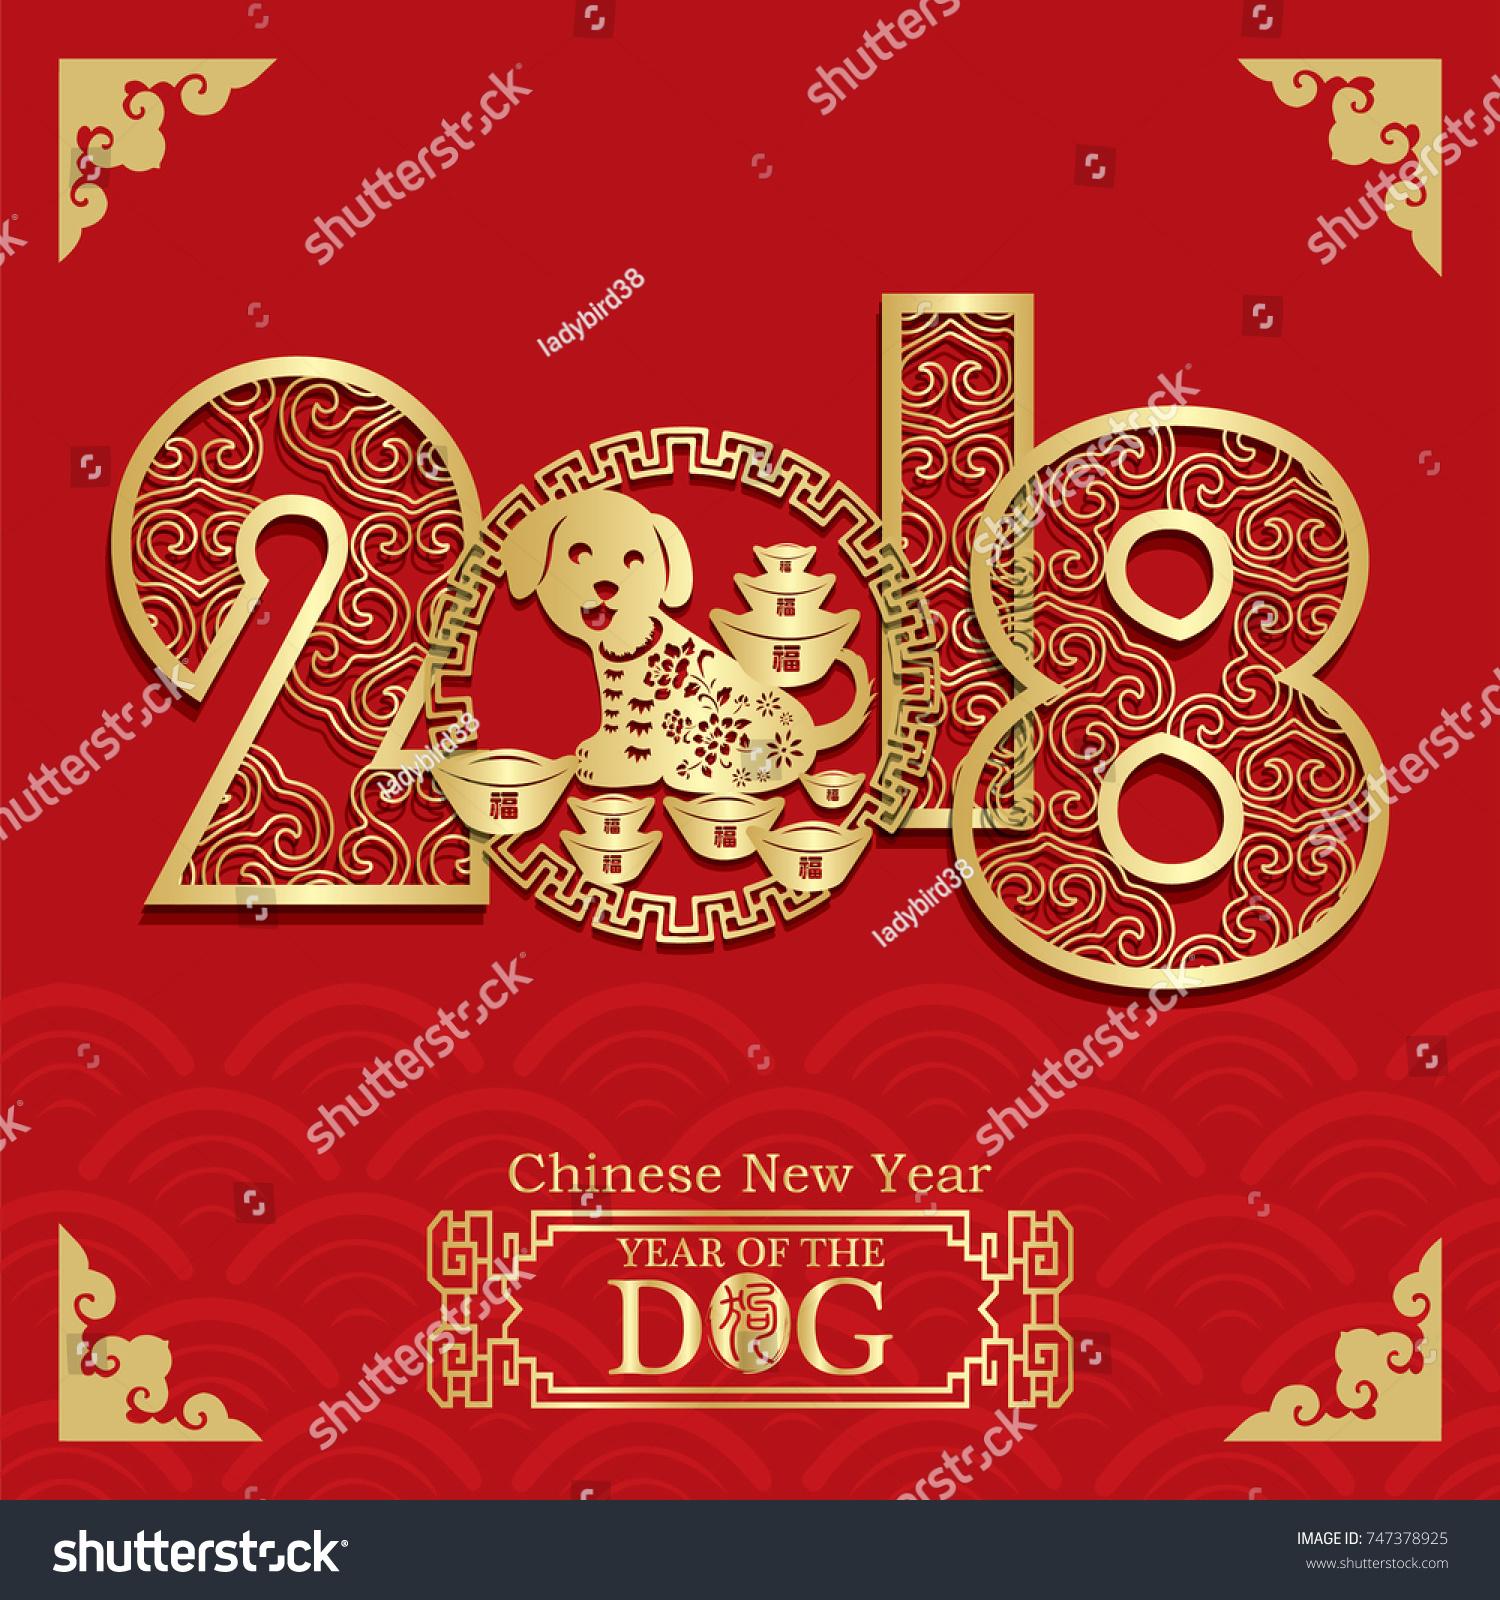 Dog year chinese zodiac symbol paper stock vector 747378925 dog year chinese zodiac symbol with paper cut art chinese new year 2018 paper cutting buycottarizona Images